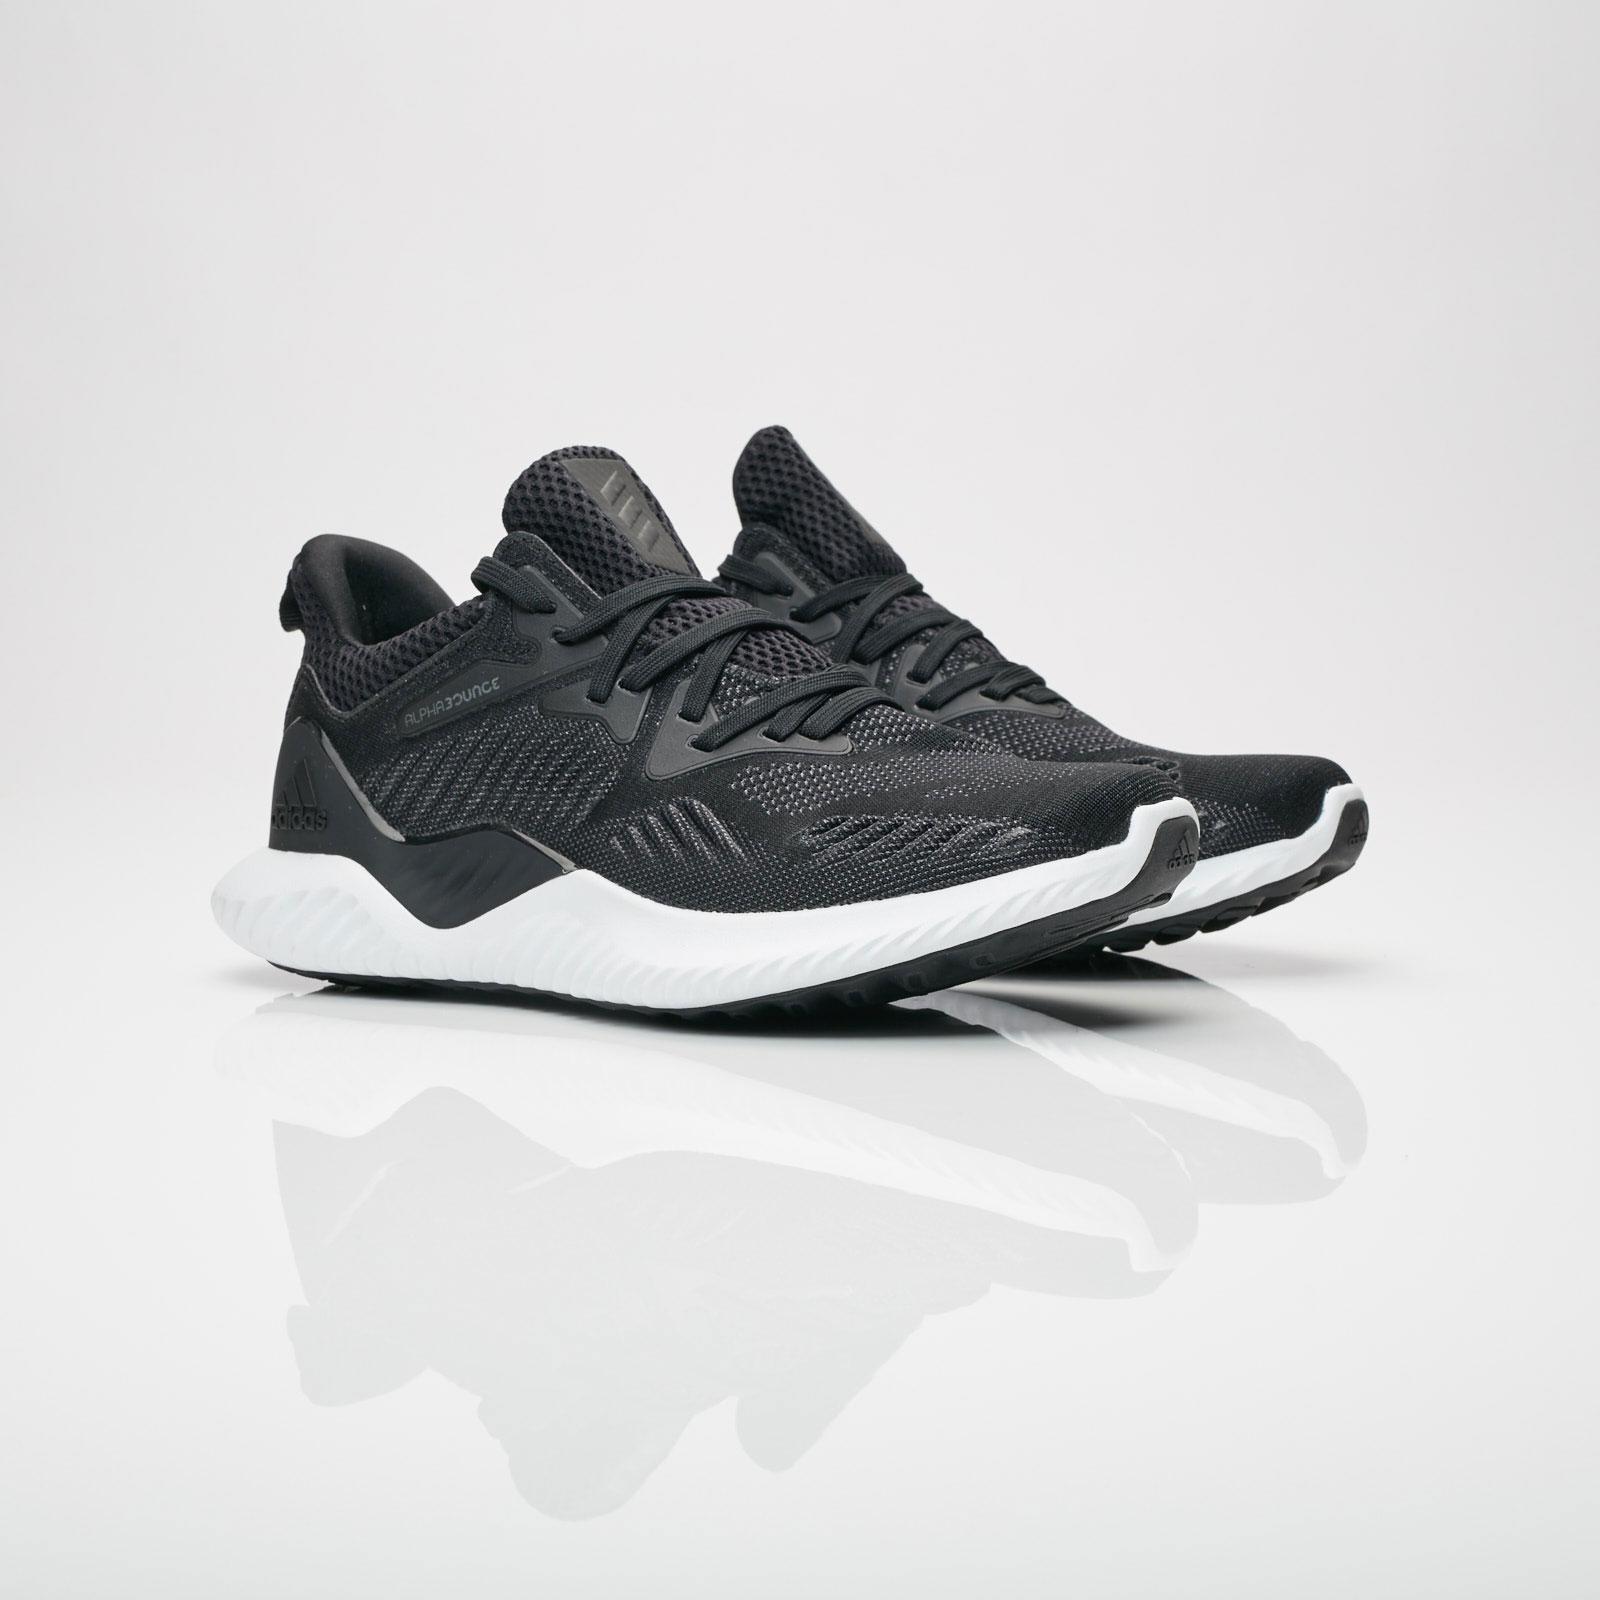 27beae8b4f0 adidas Alphabounce Beyond W - Ac8633 - Sneakersnstuff